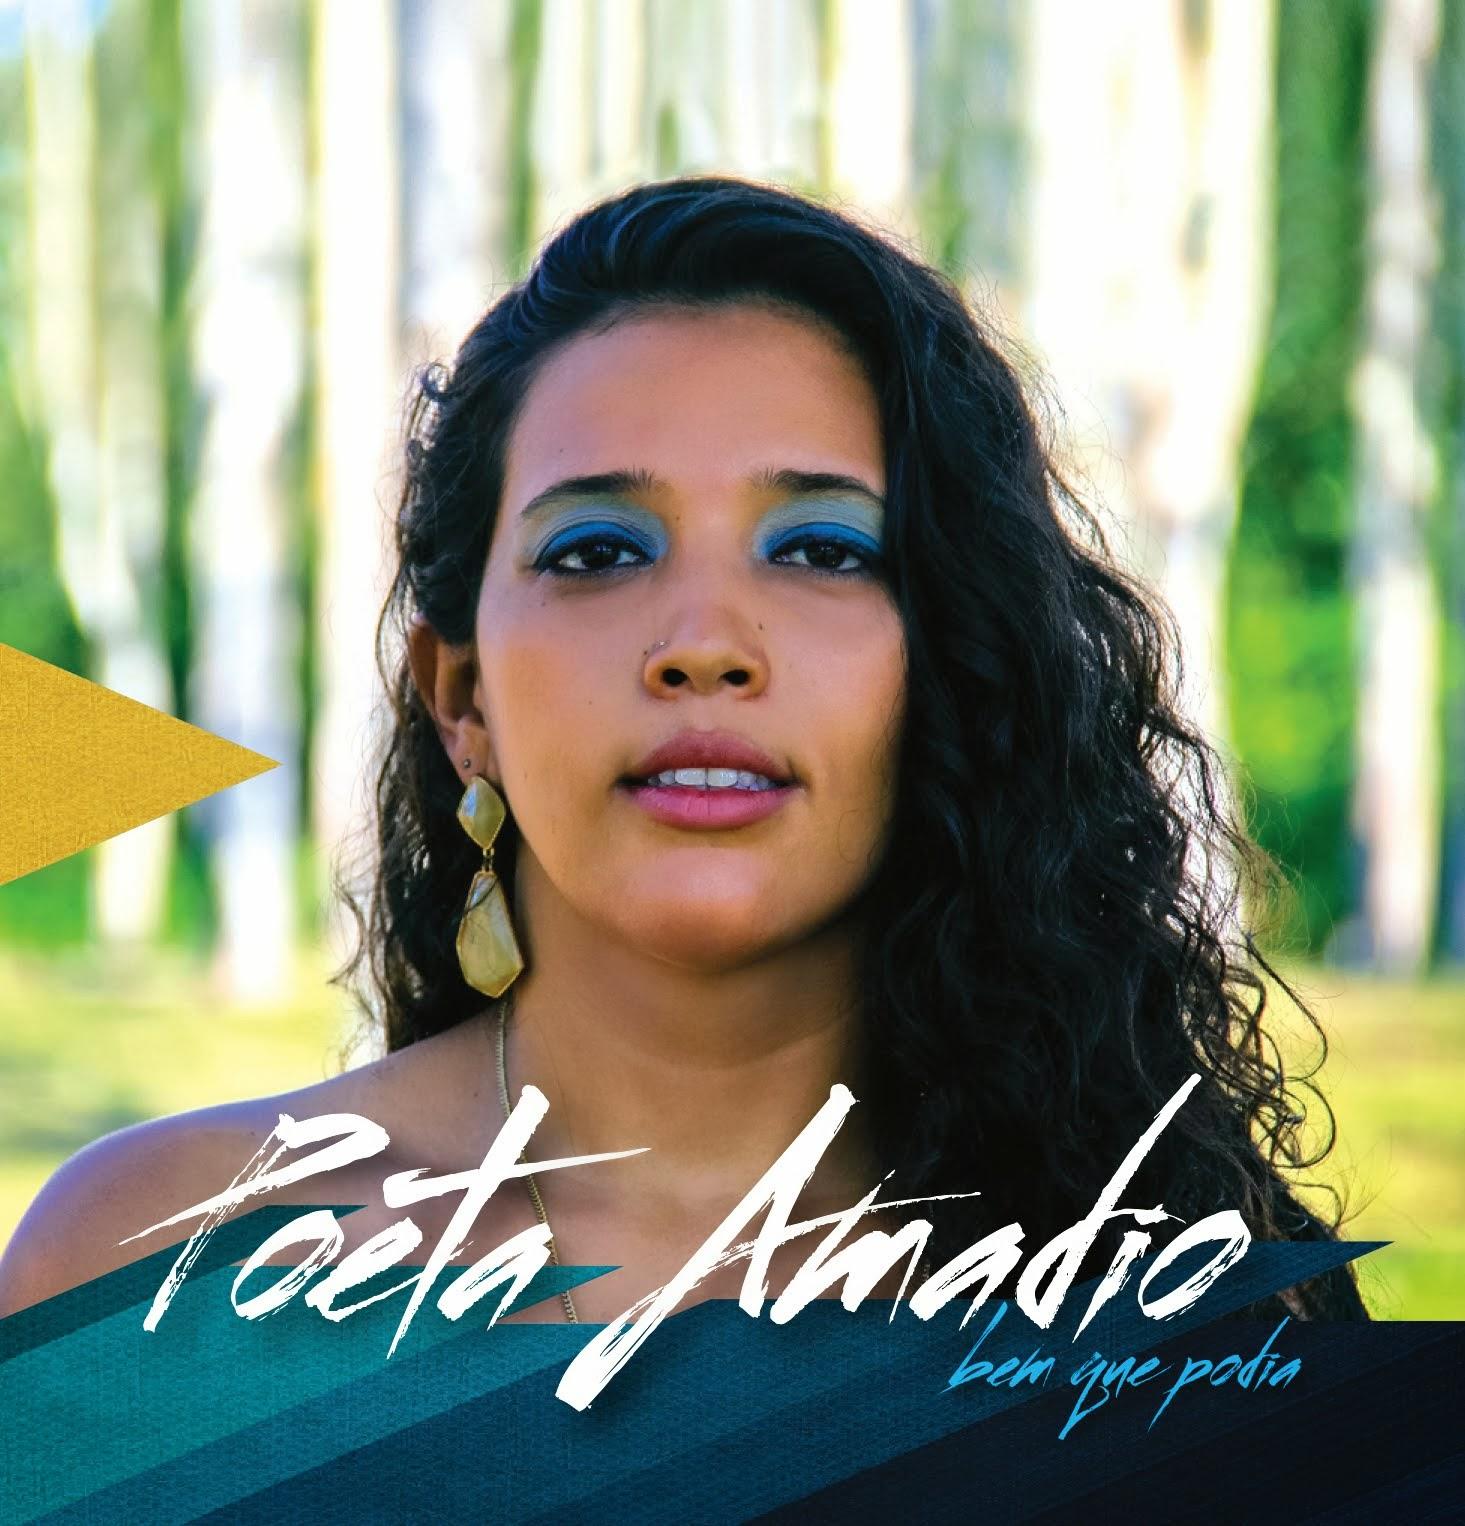 Poeta Amadio